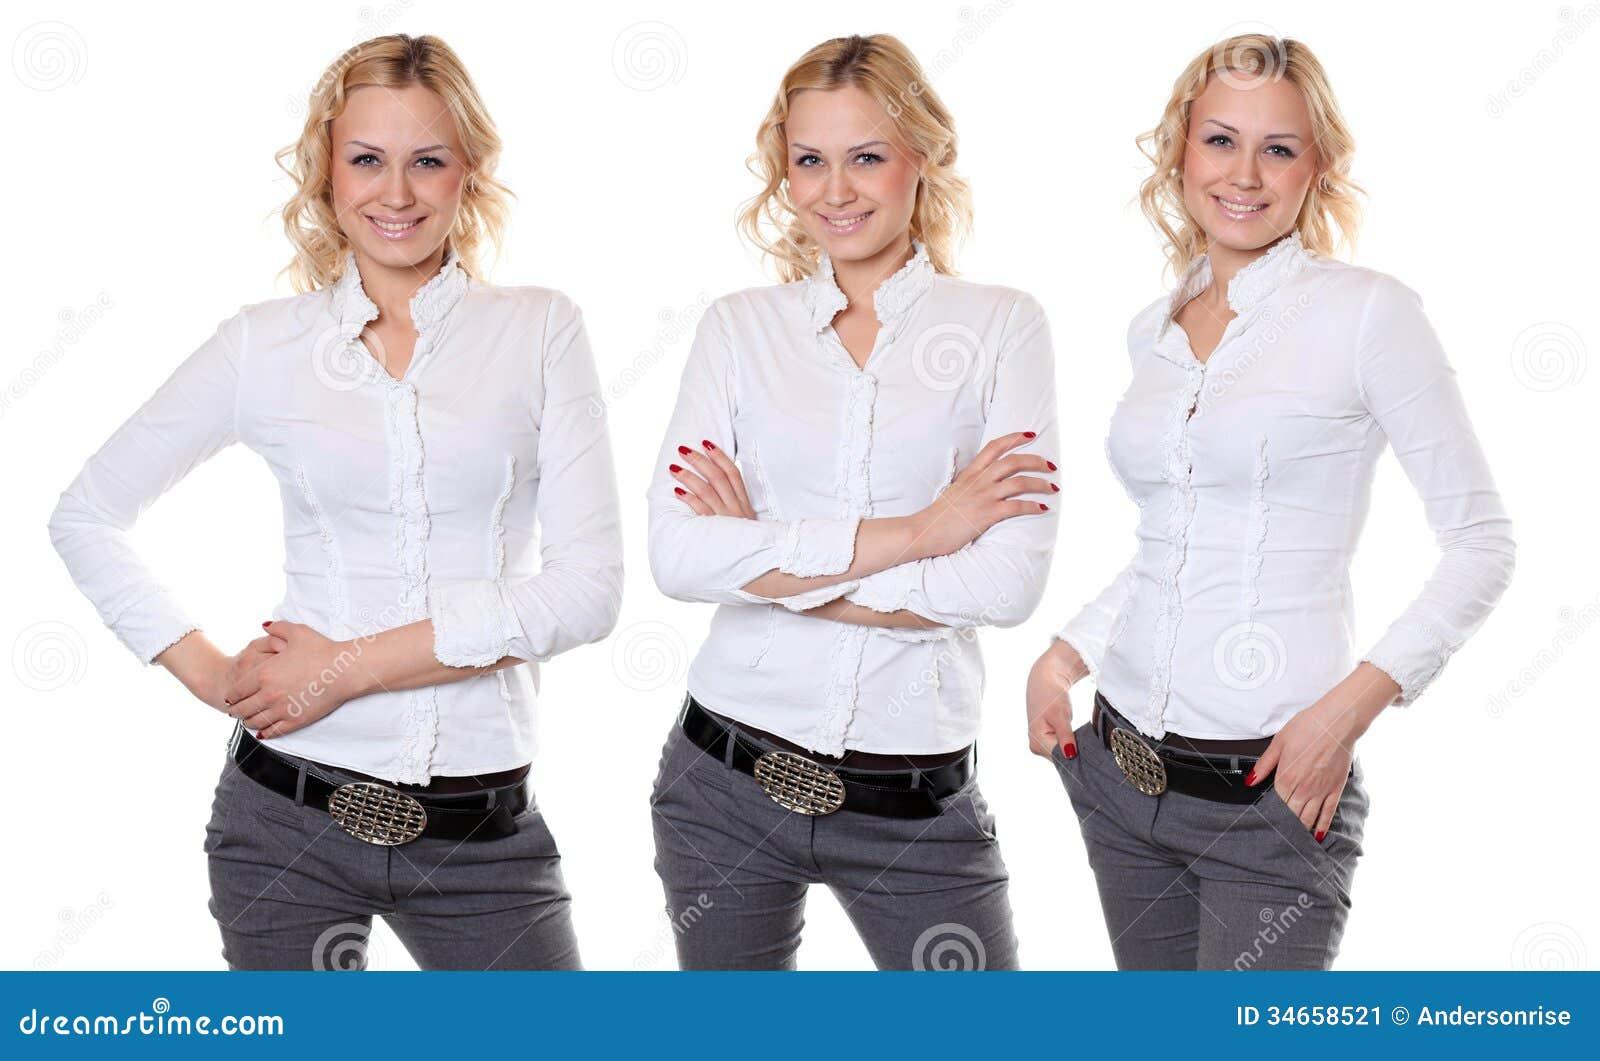 Collage Beautiful Women In White Shirt Stock Image - Image: 34658521